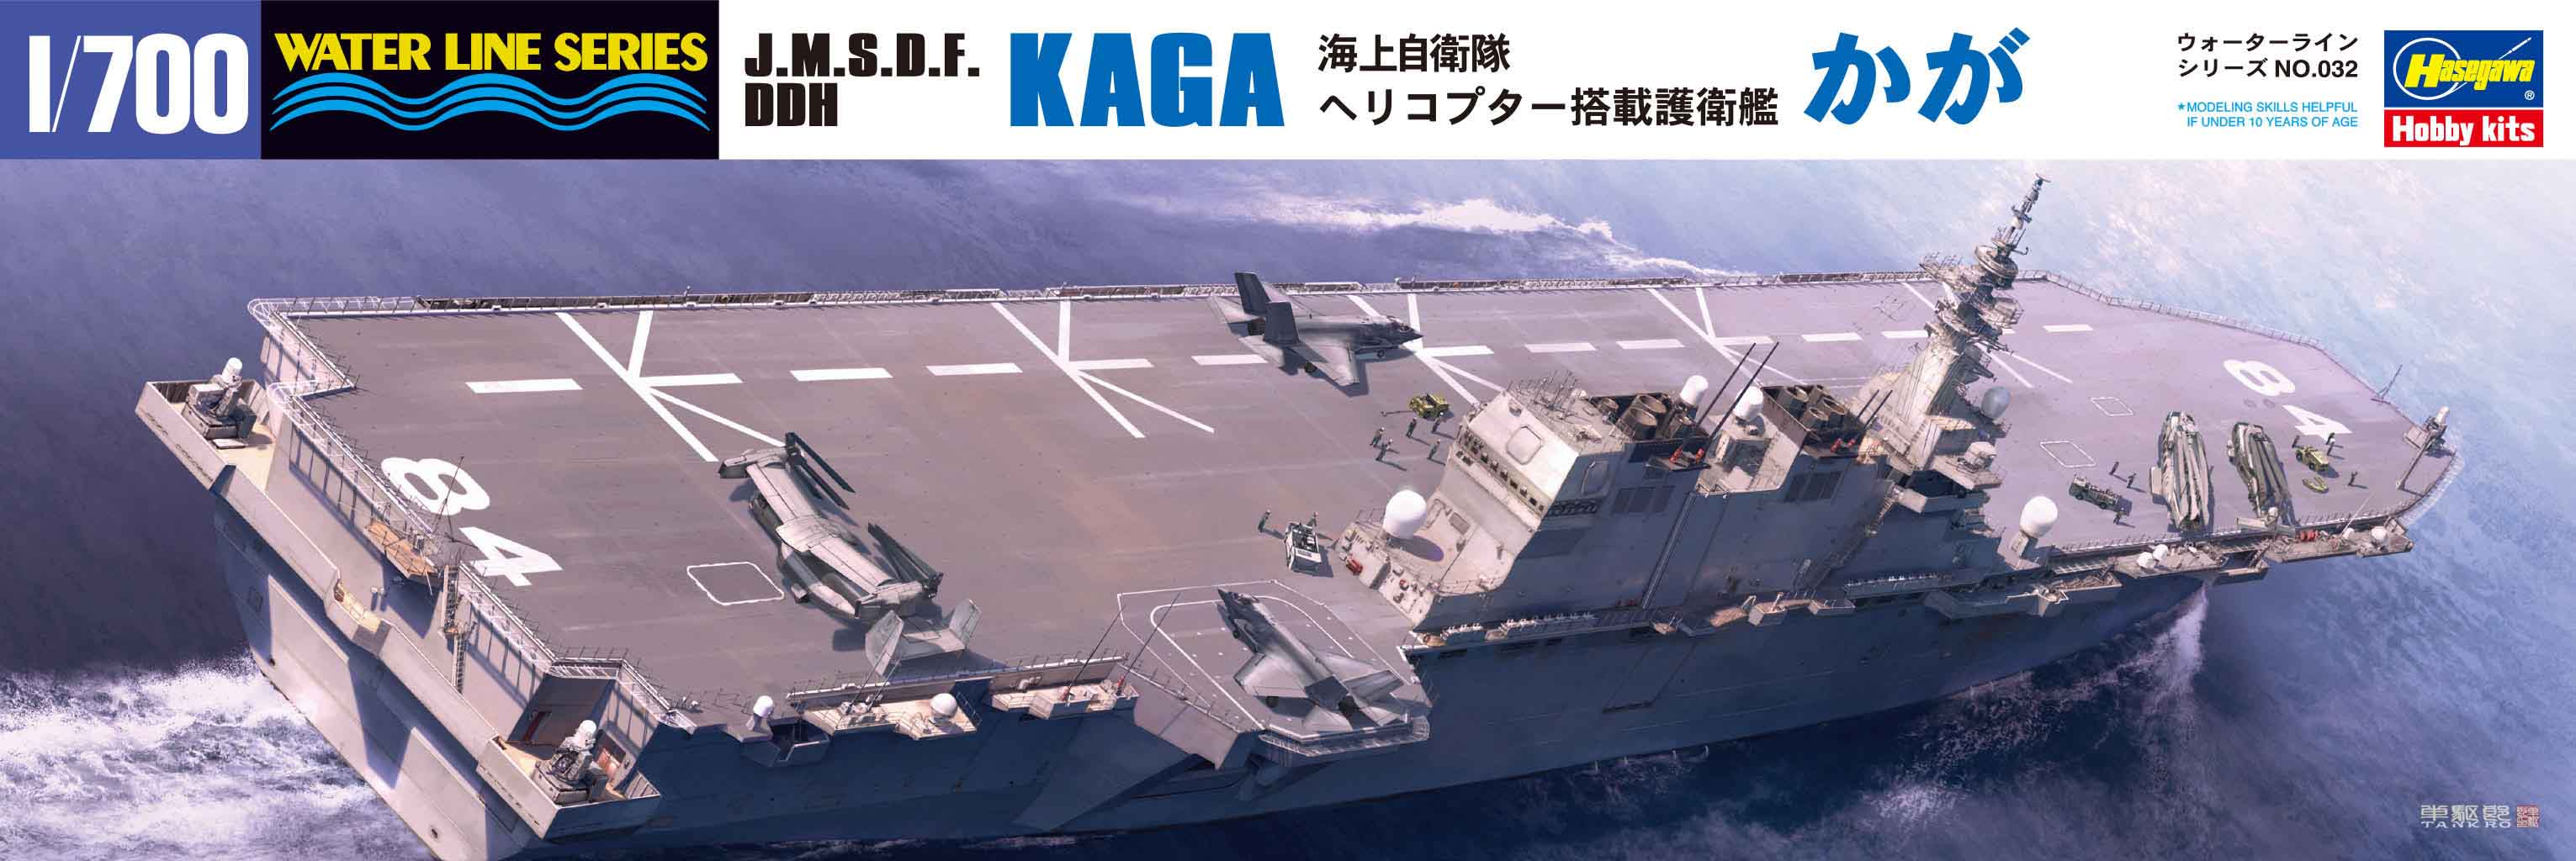 Hasegawa J.M.S.D.F. Ddh Kaga